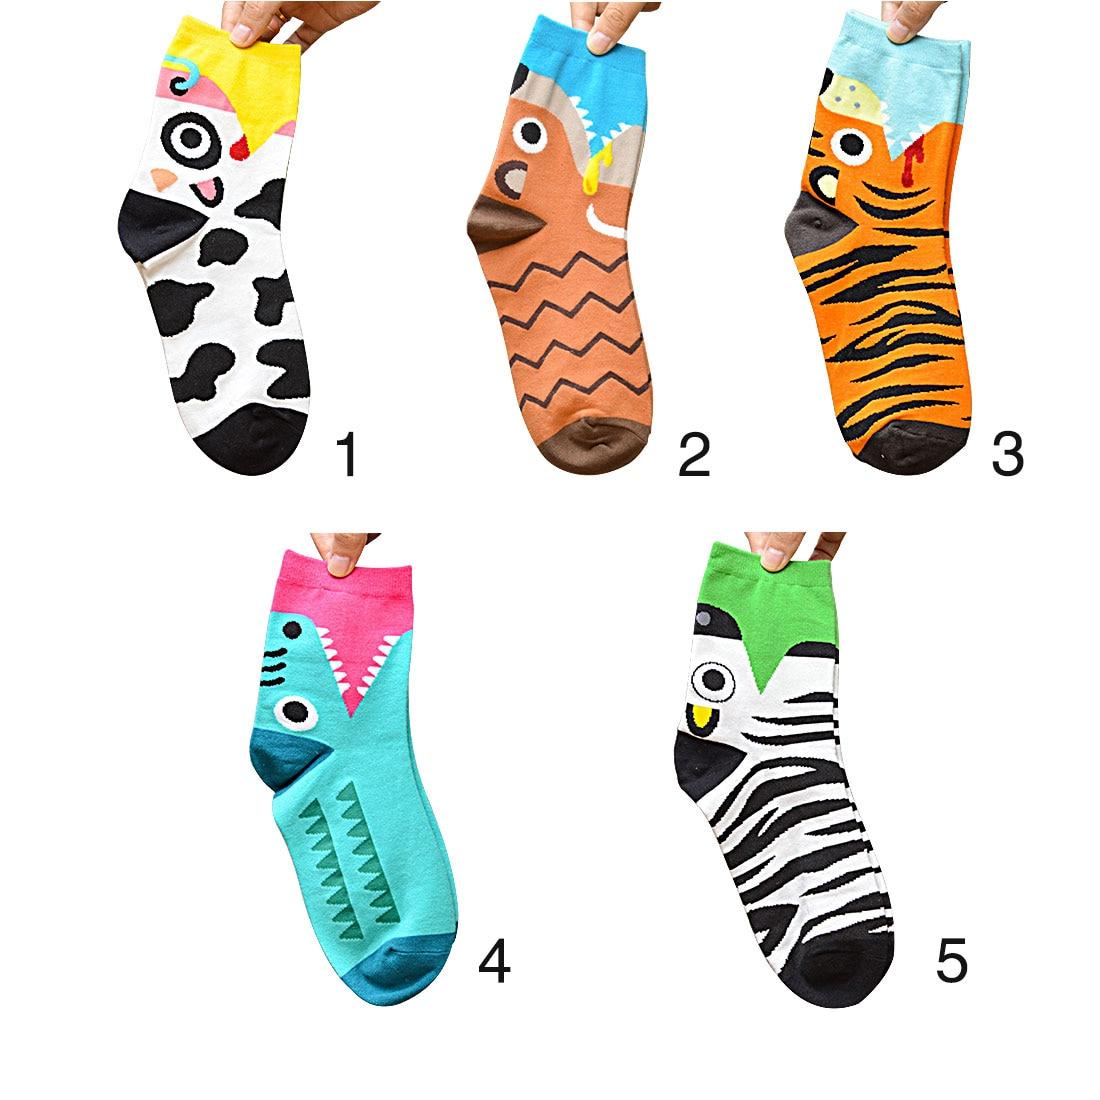 Hot New Hot-Sell Women Cartoon Socks Autumn-Winter Animal Soks Lady And WomenS Cute Cartoon Funny Cotton 3D Socks